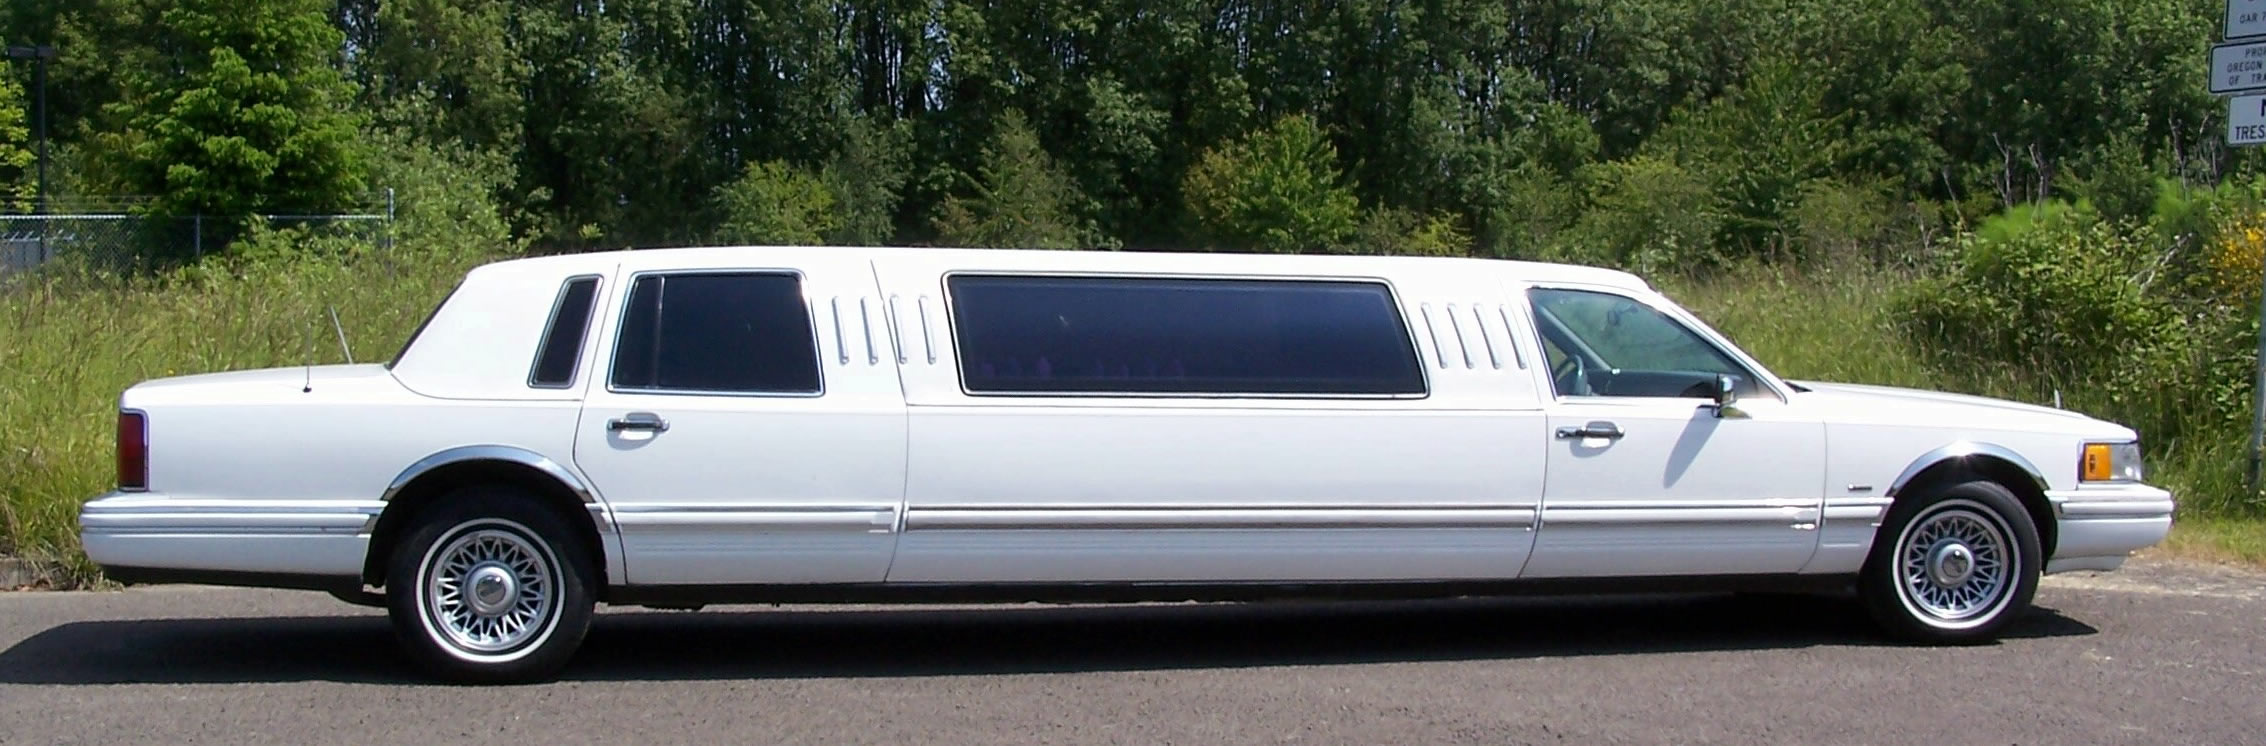 Topworldauto Gt Gt Photos Of Lincoln Town Car Limousine